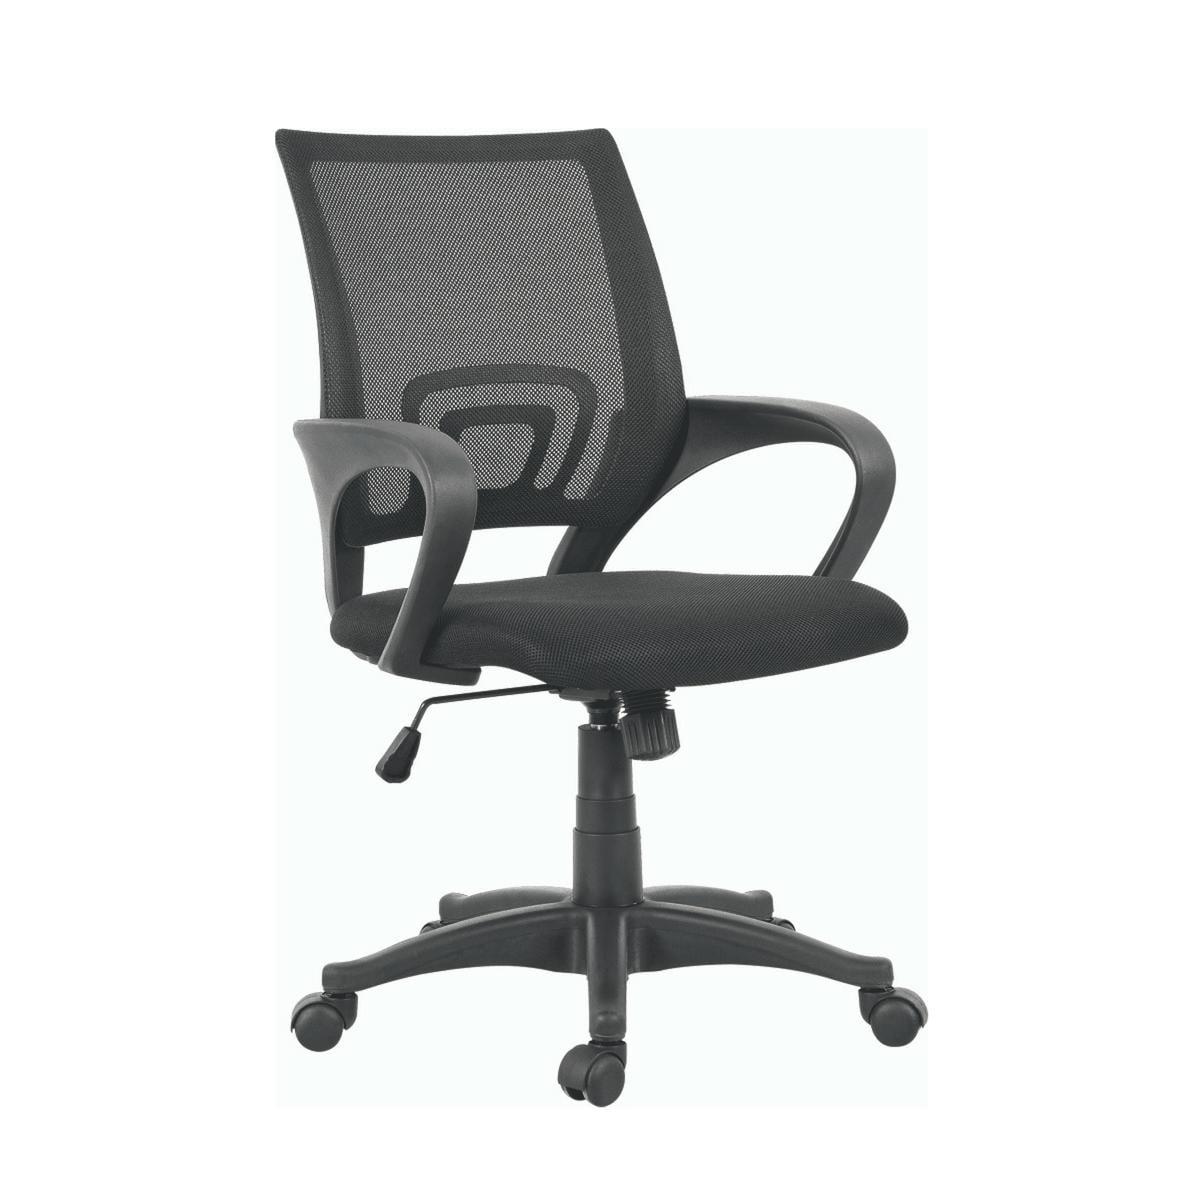 Markus Black Mesh Office Chair